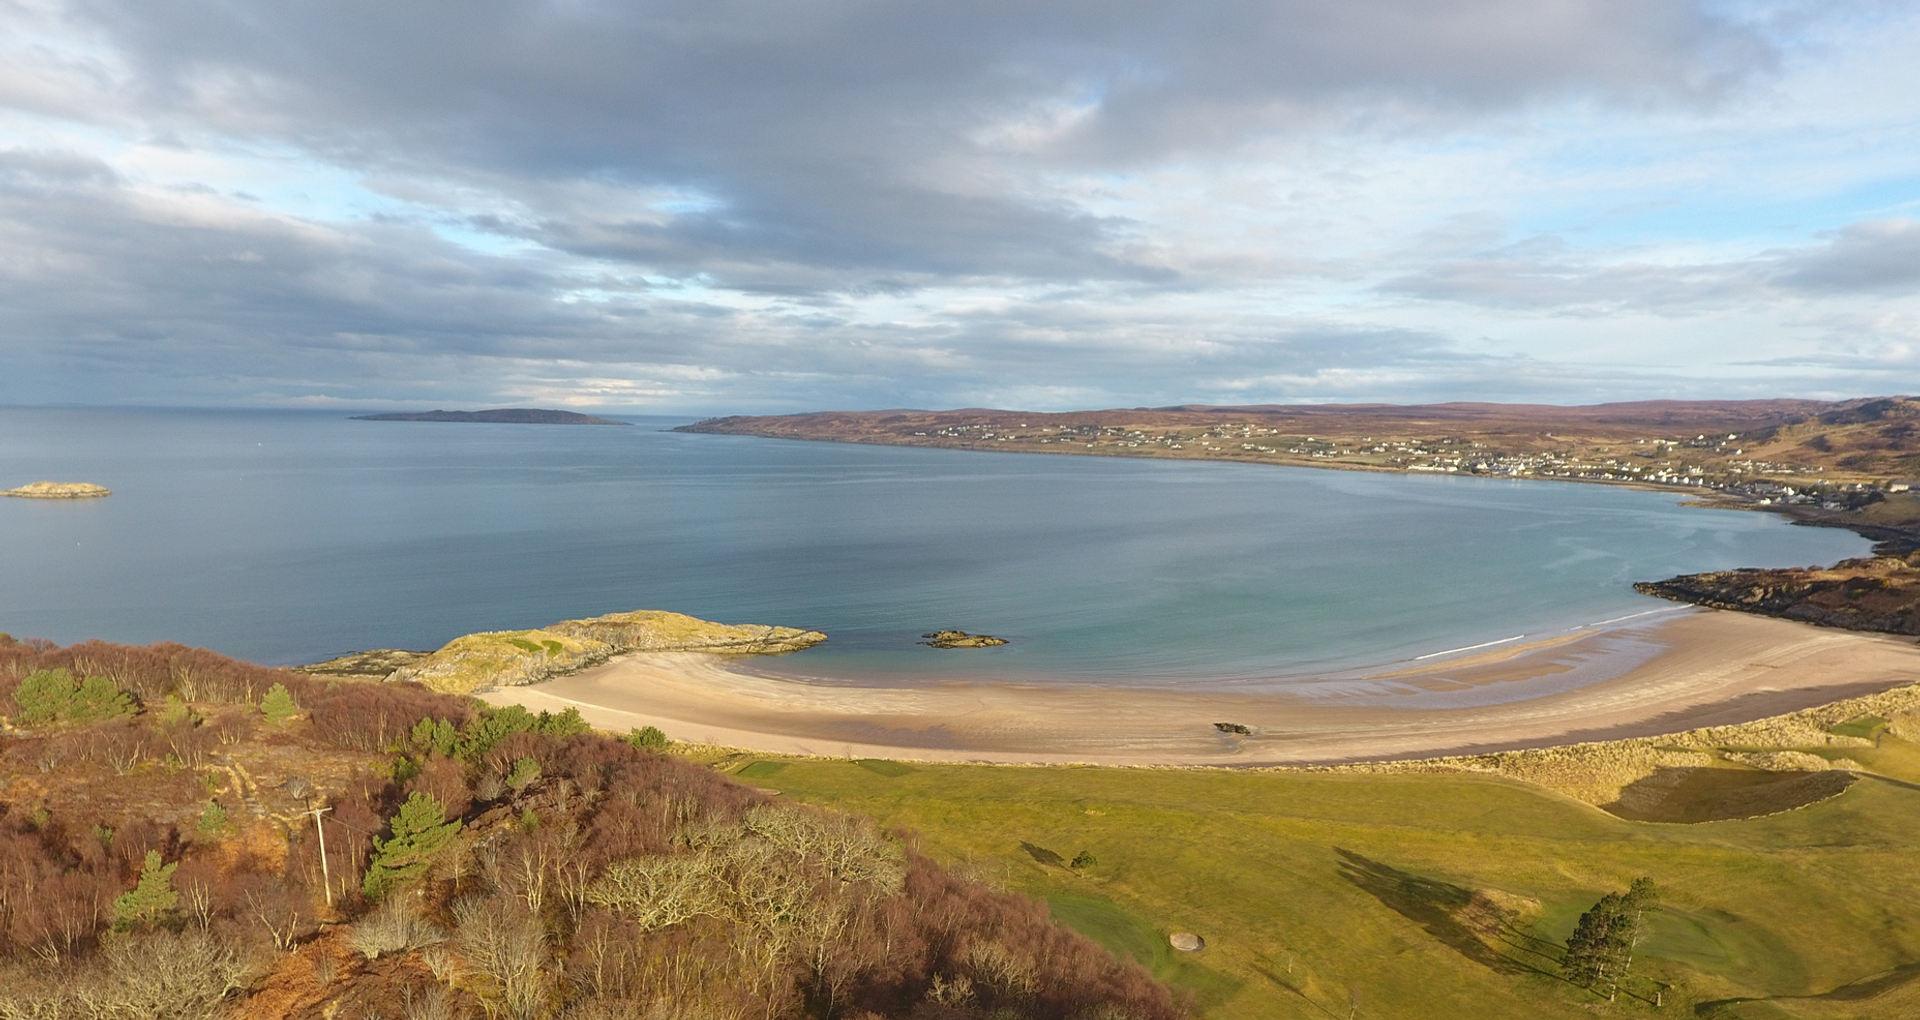 Gairloch beach and golf course